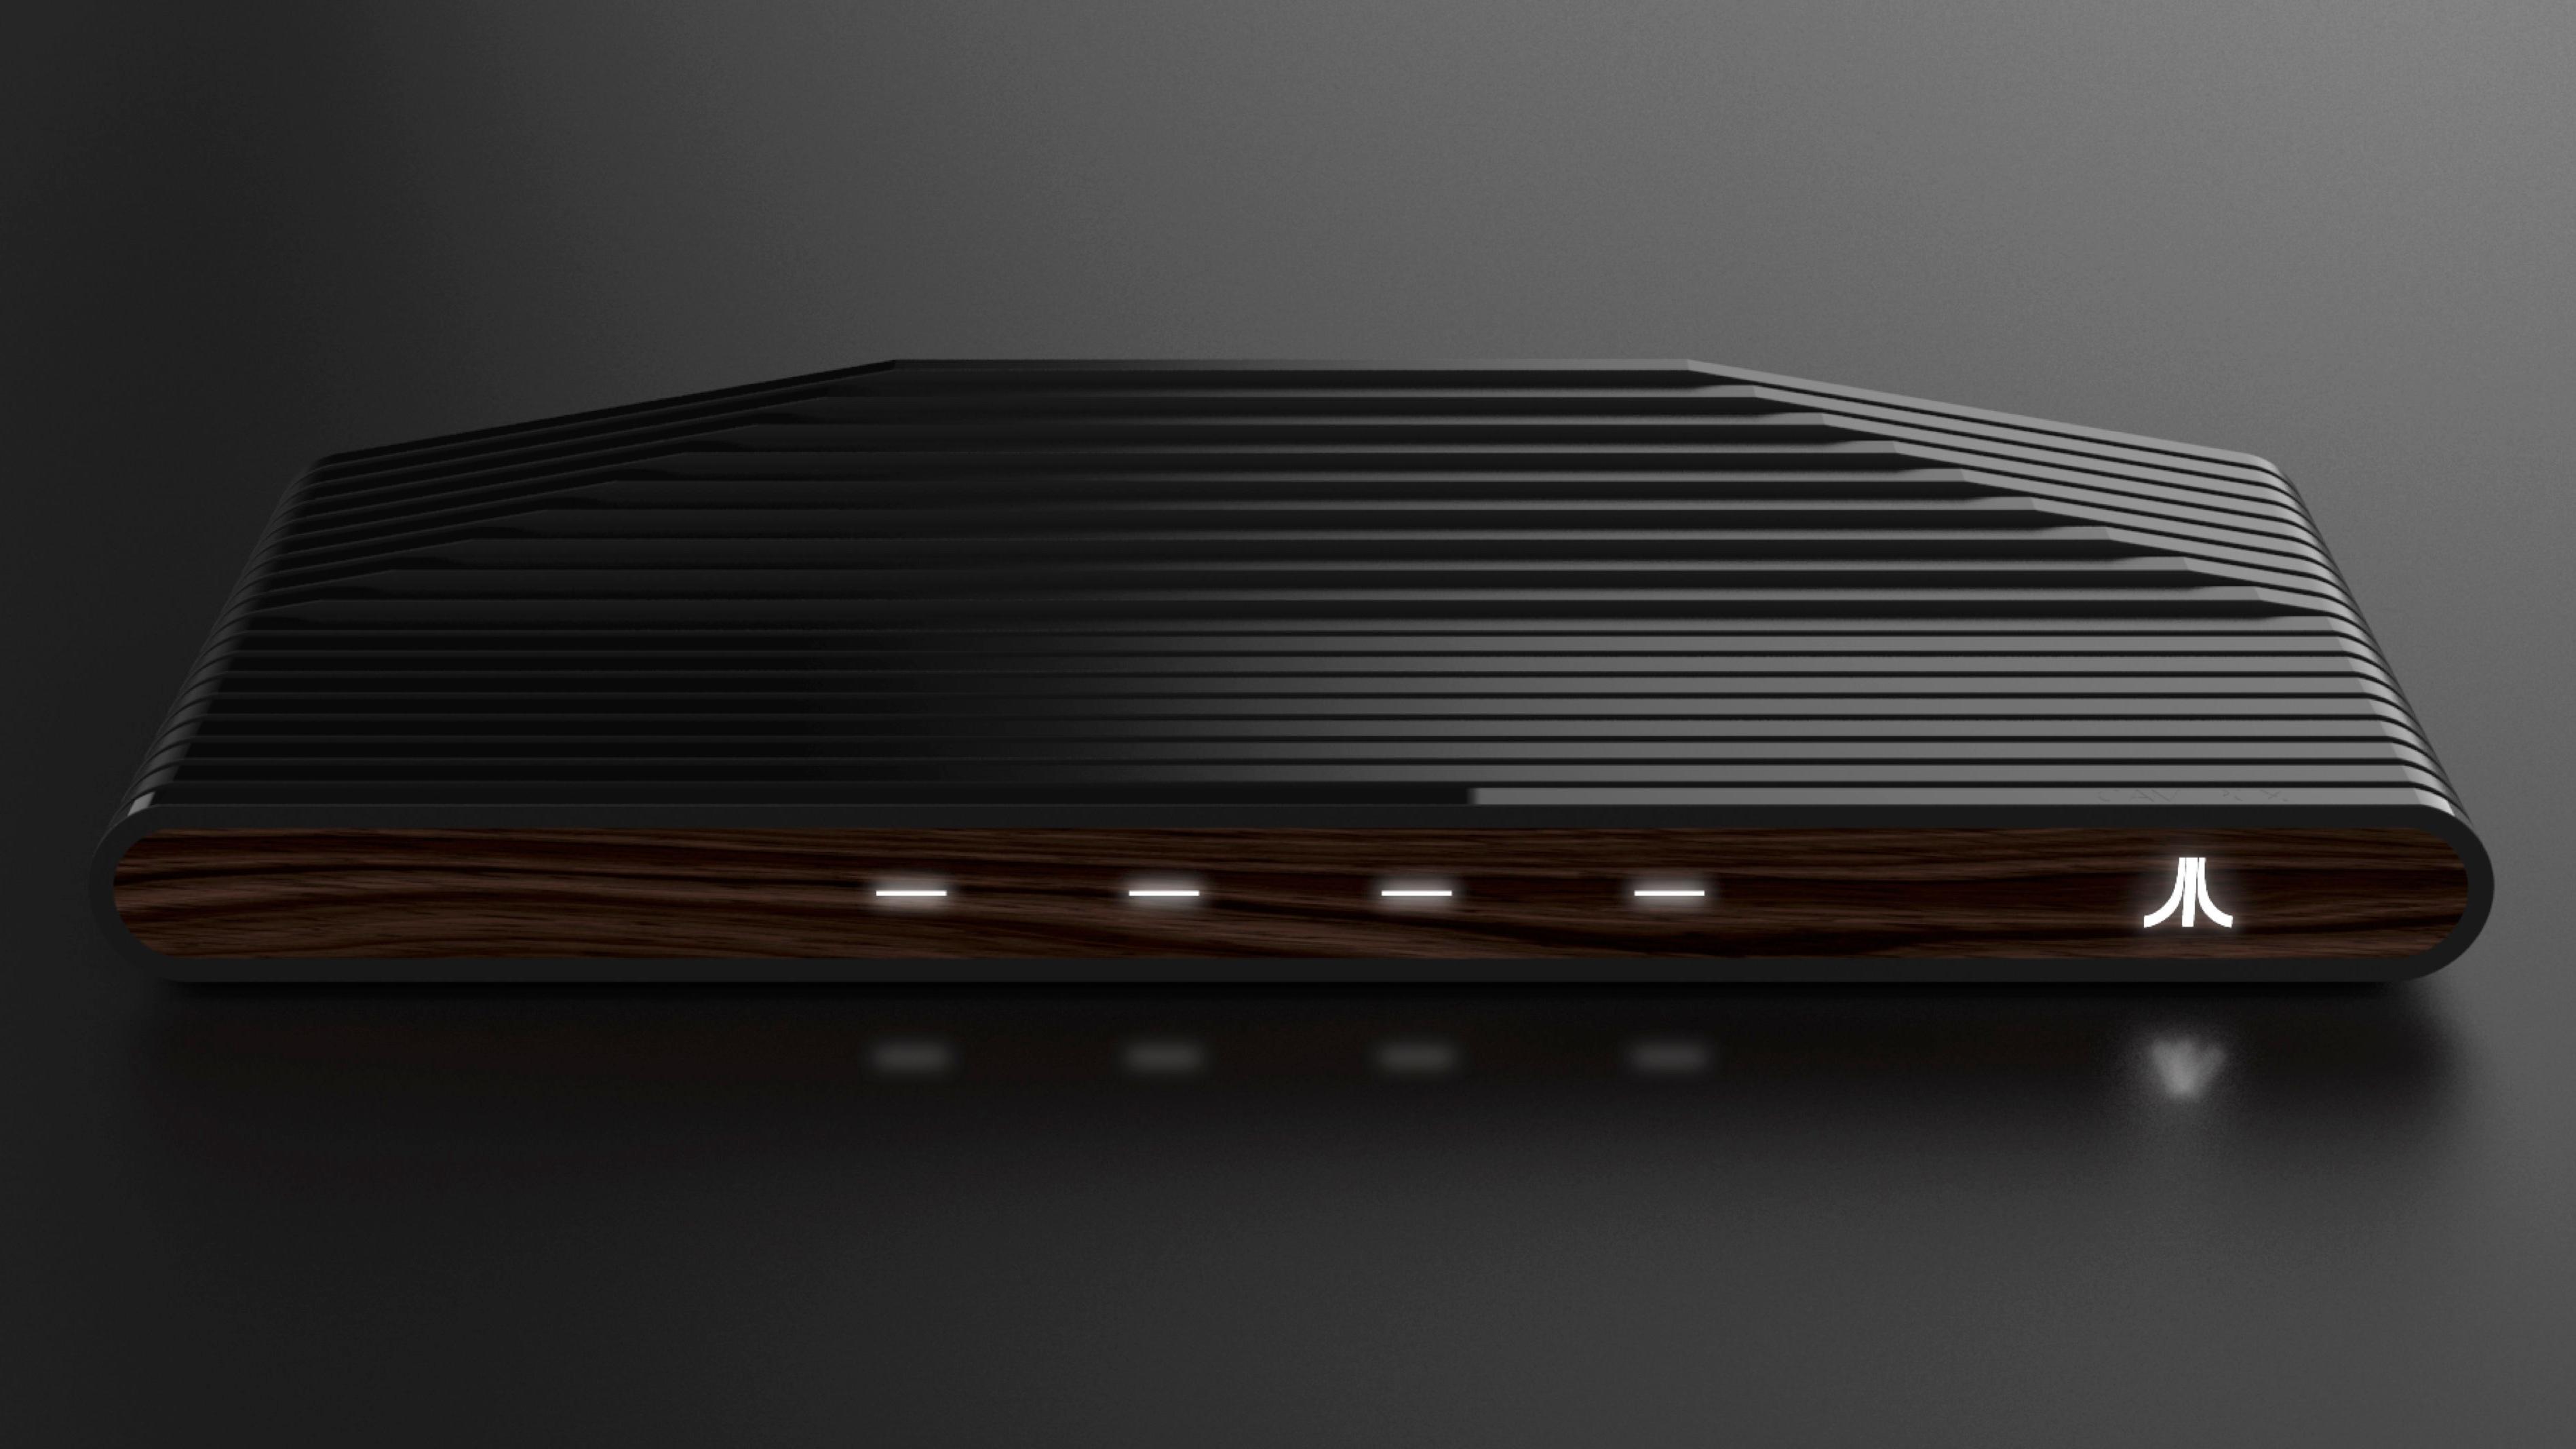 New Atari Console 2020 Atari VCS: everything you need to know about Atari's comeback